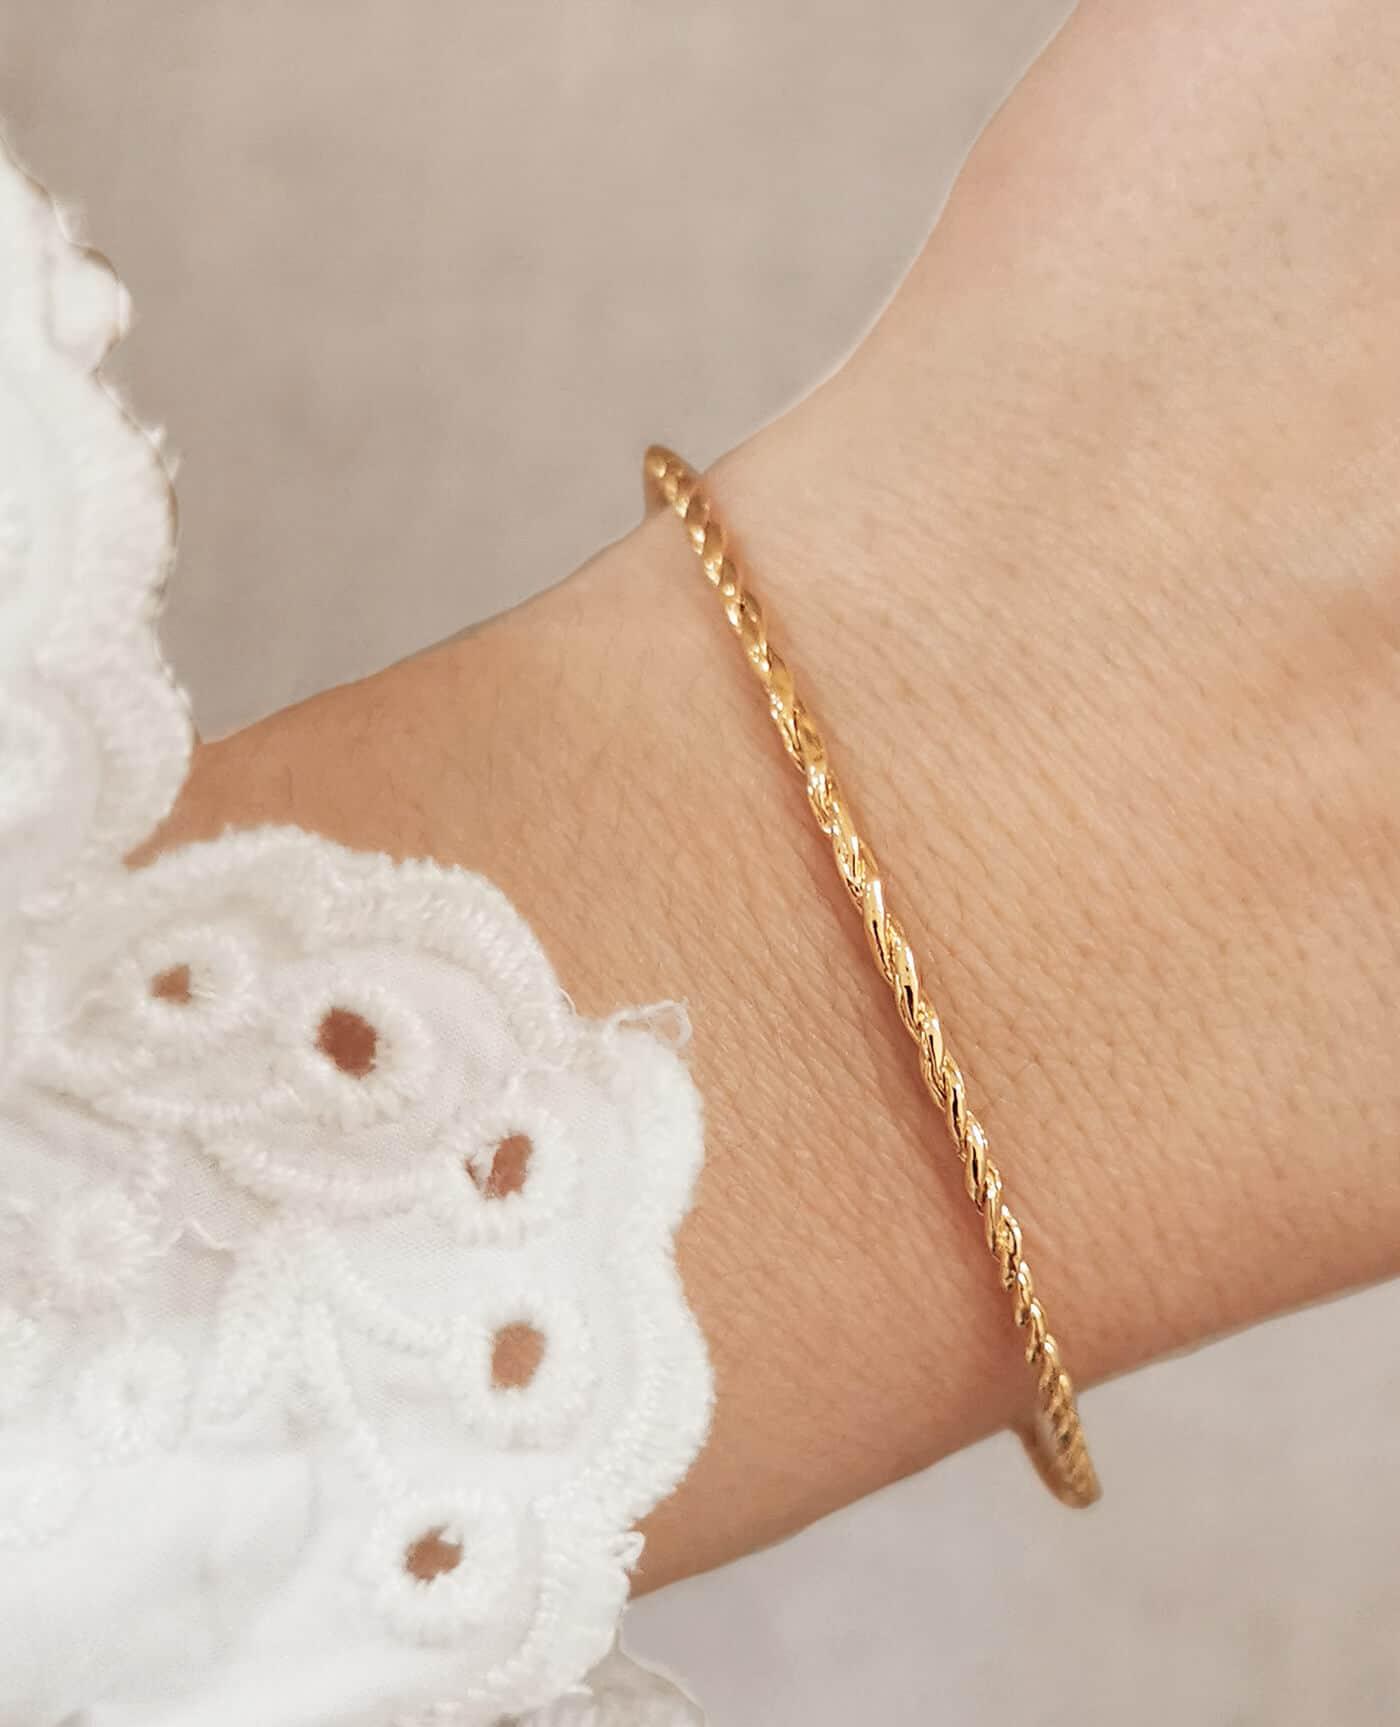 Bracelet jonc fin torsadé ceiba de la marque Elise Tsikis